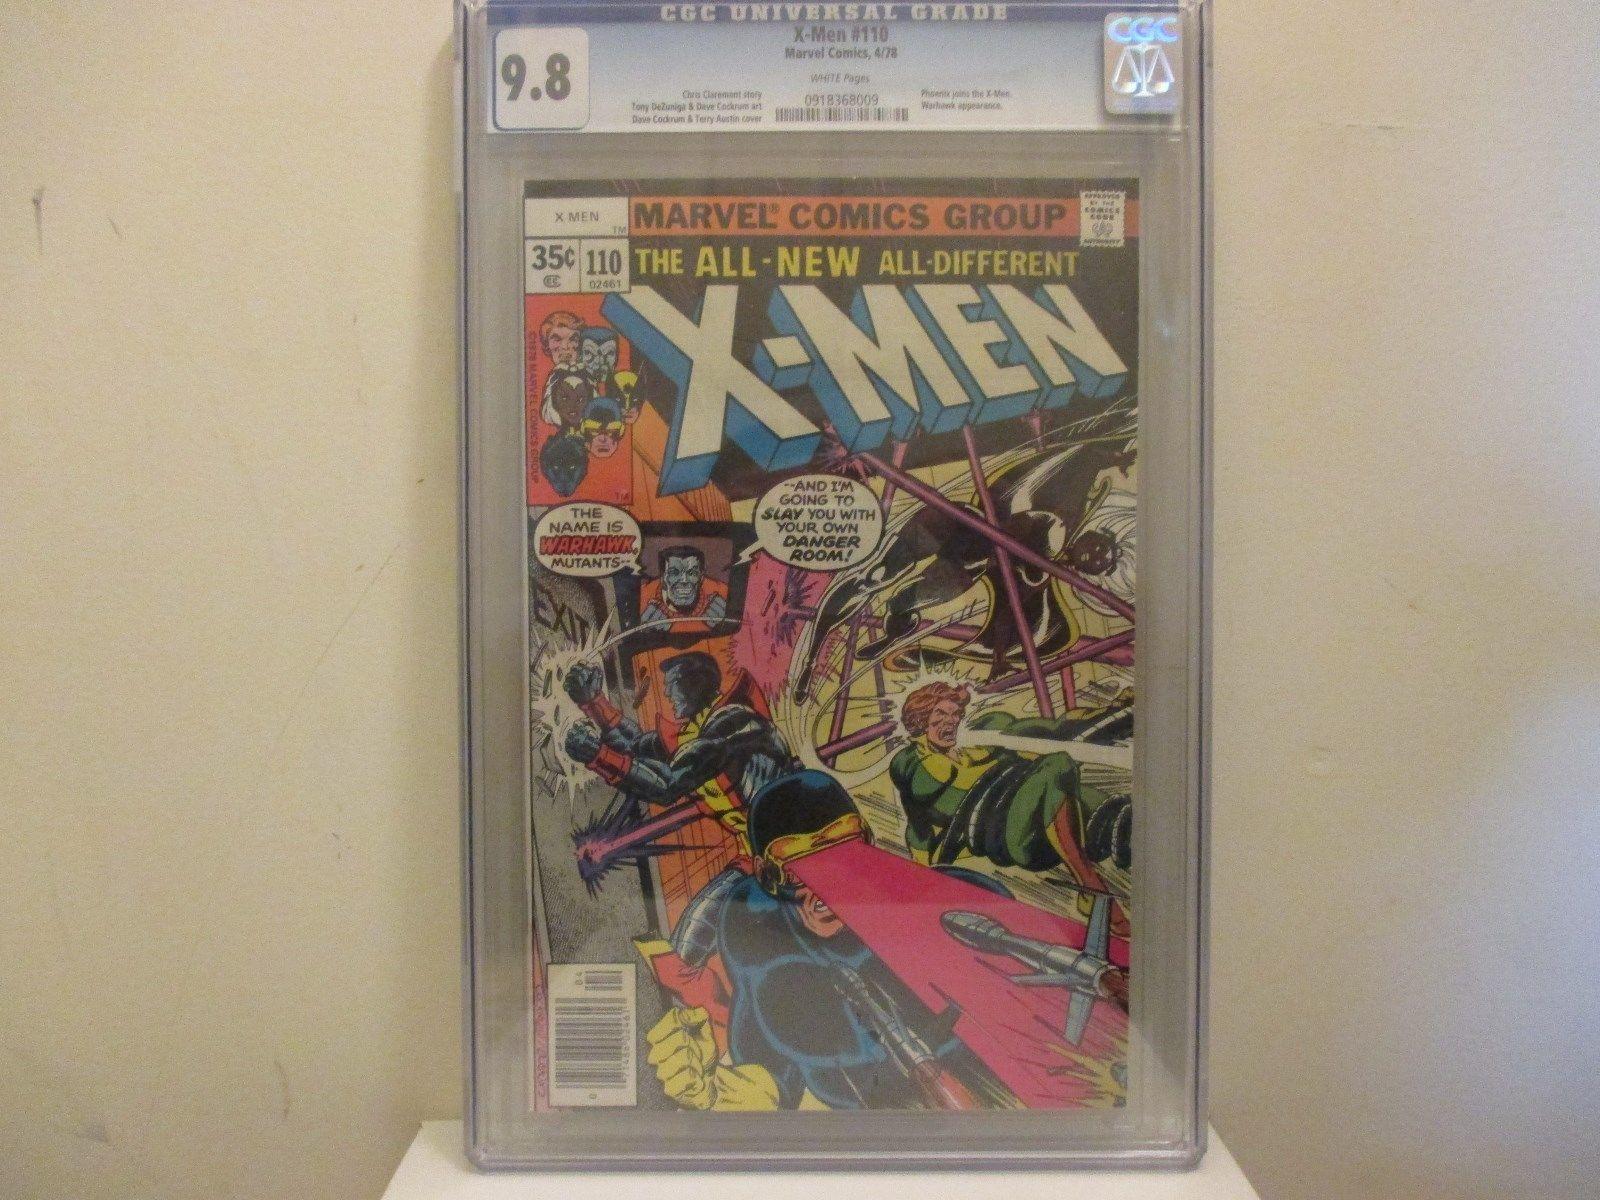 Uncanny X-Men from 1978 (1963 1st Series) #110 CGC 9.8 0918368009 Cockrum art